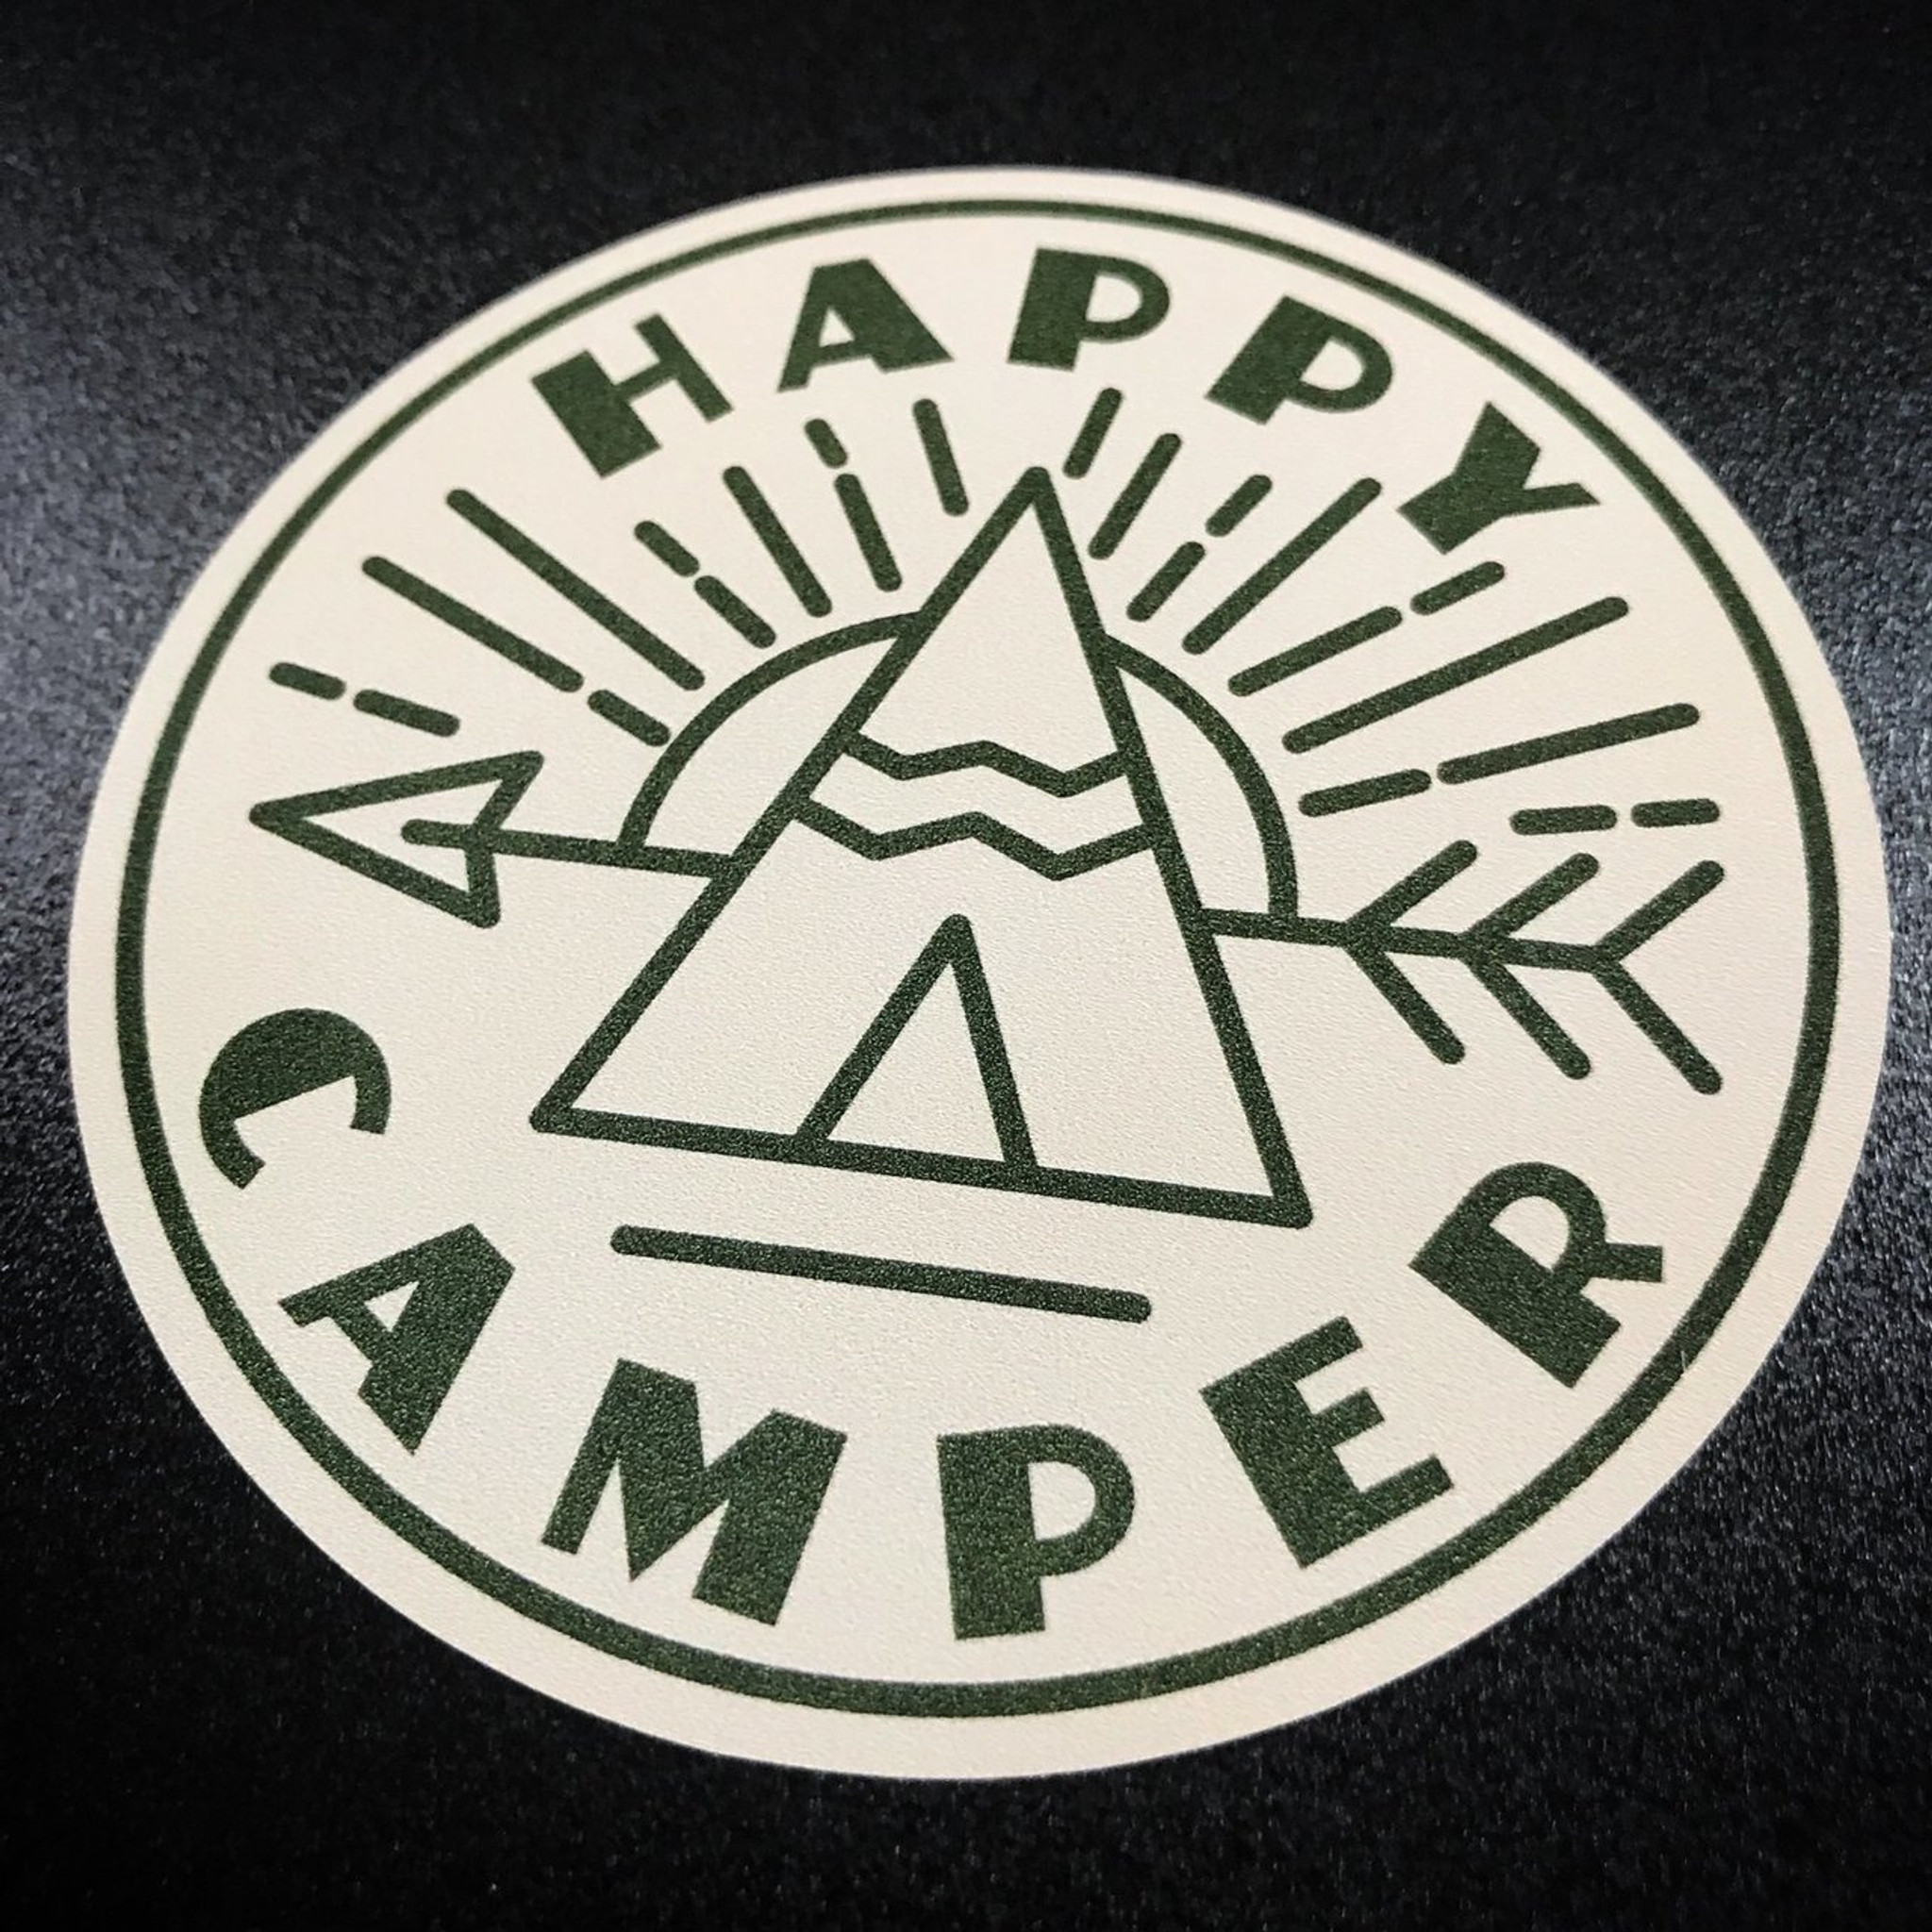 Happy Camper Lone Star Signs